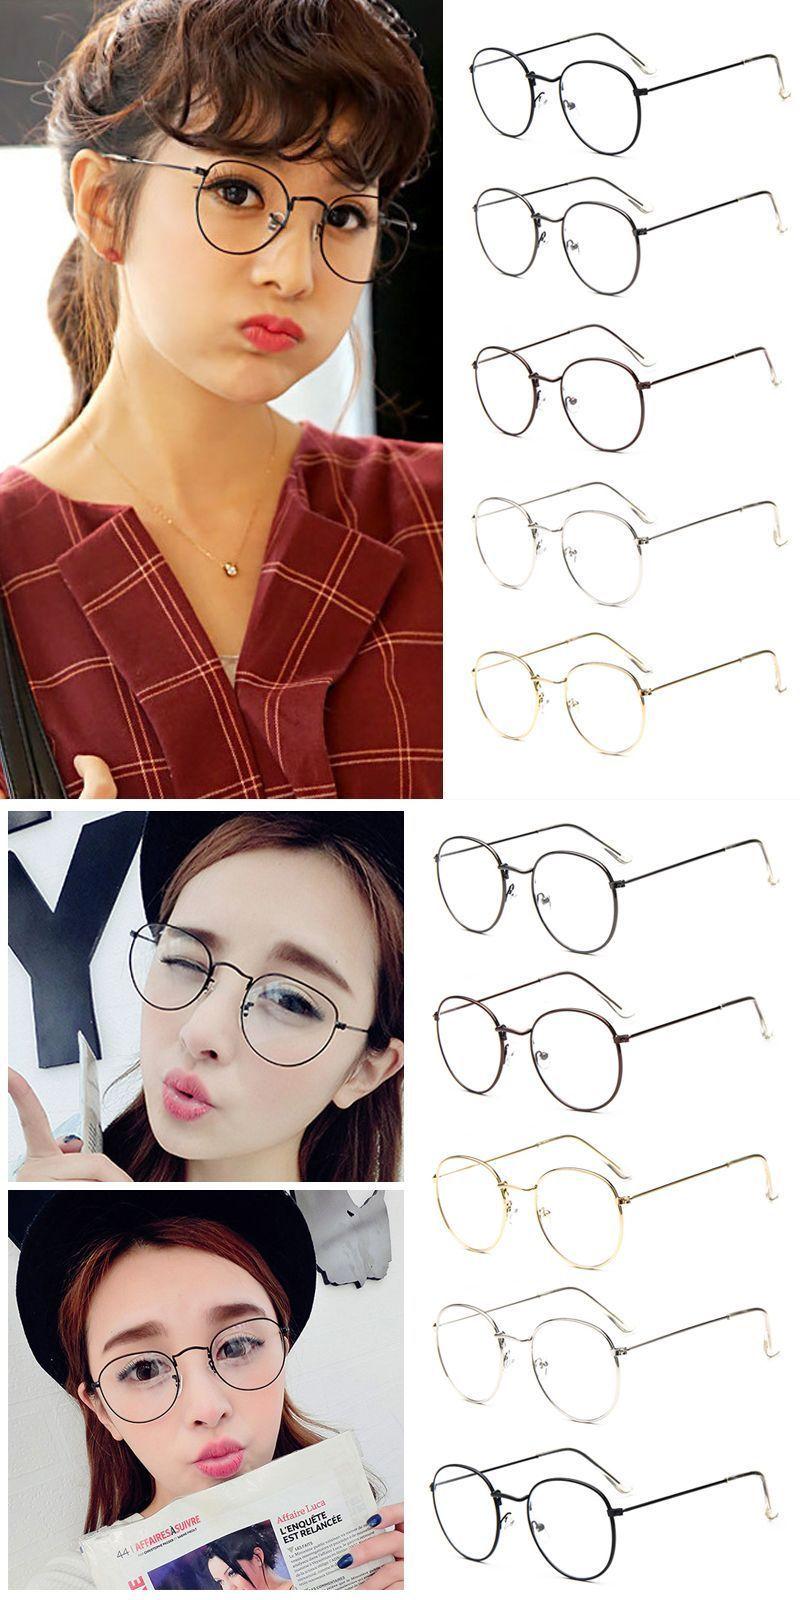 19f55a546b Fashion vintage women eye glasses frames plain mirror literary harajuku big  metal oval frame glasses oculos feminino masculino  frames  eyewear   accessories ...